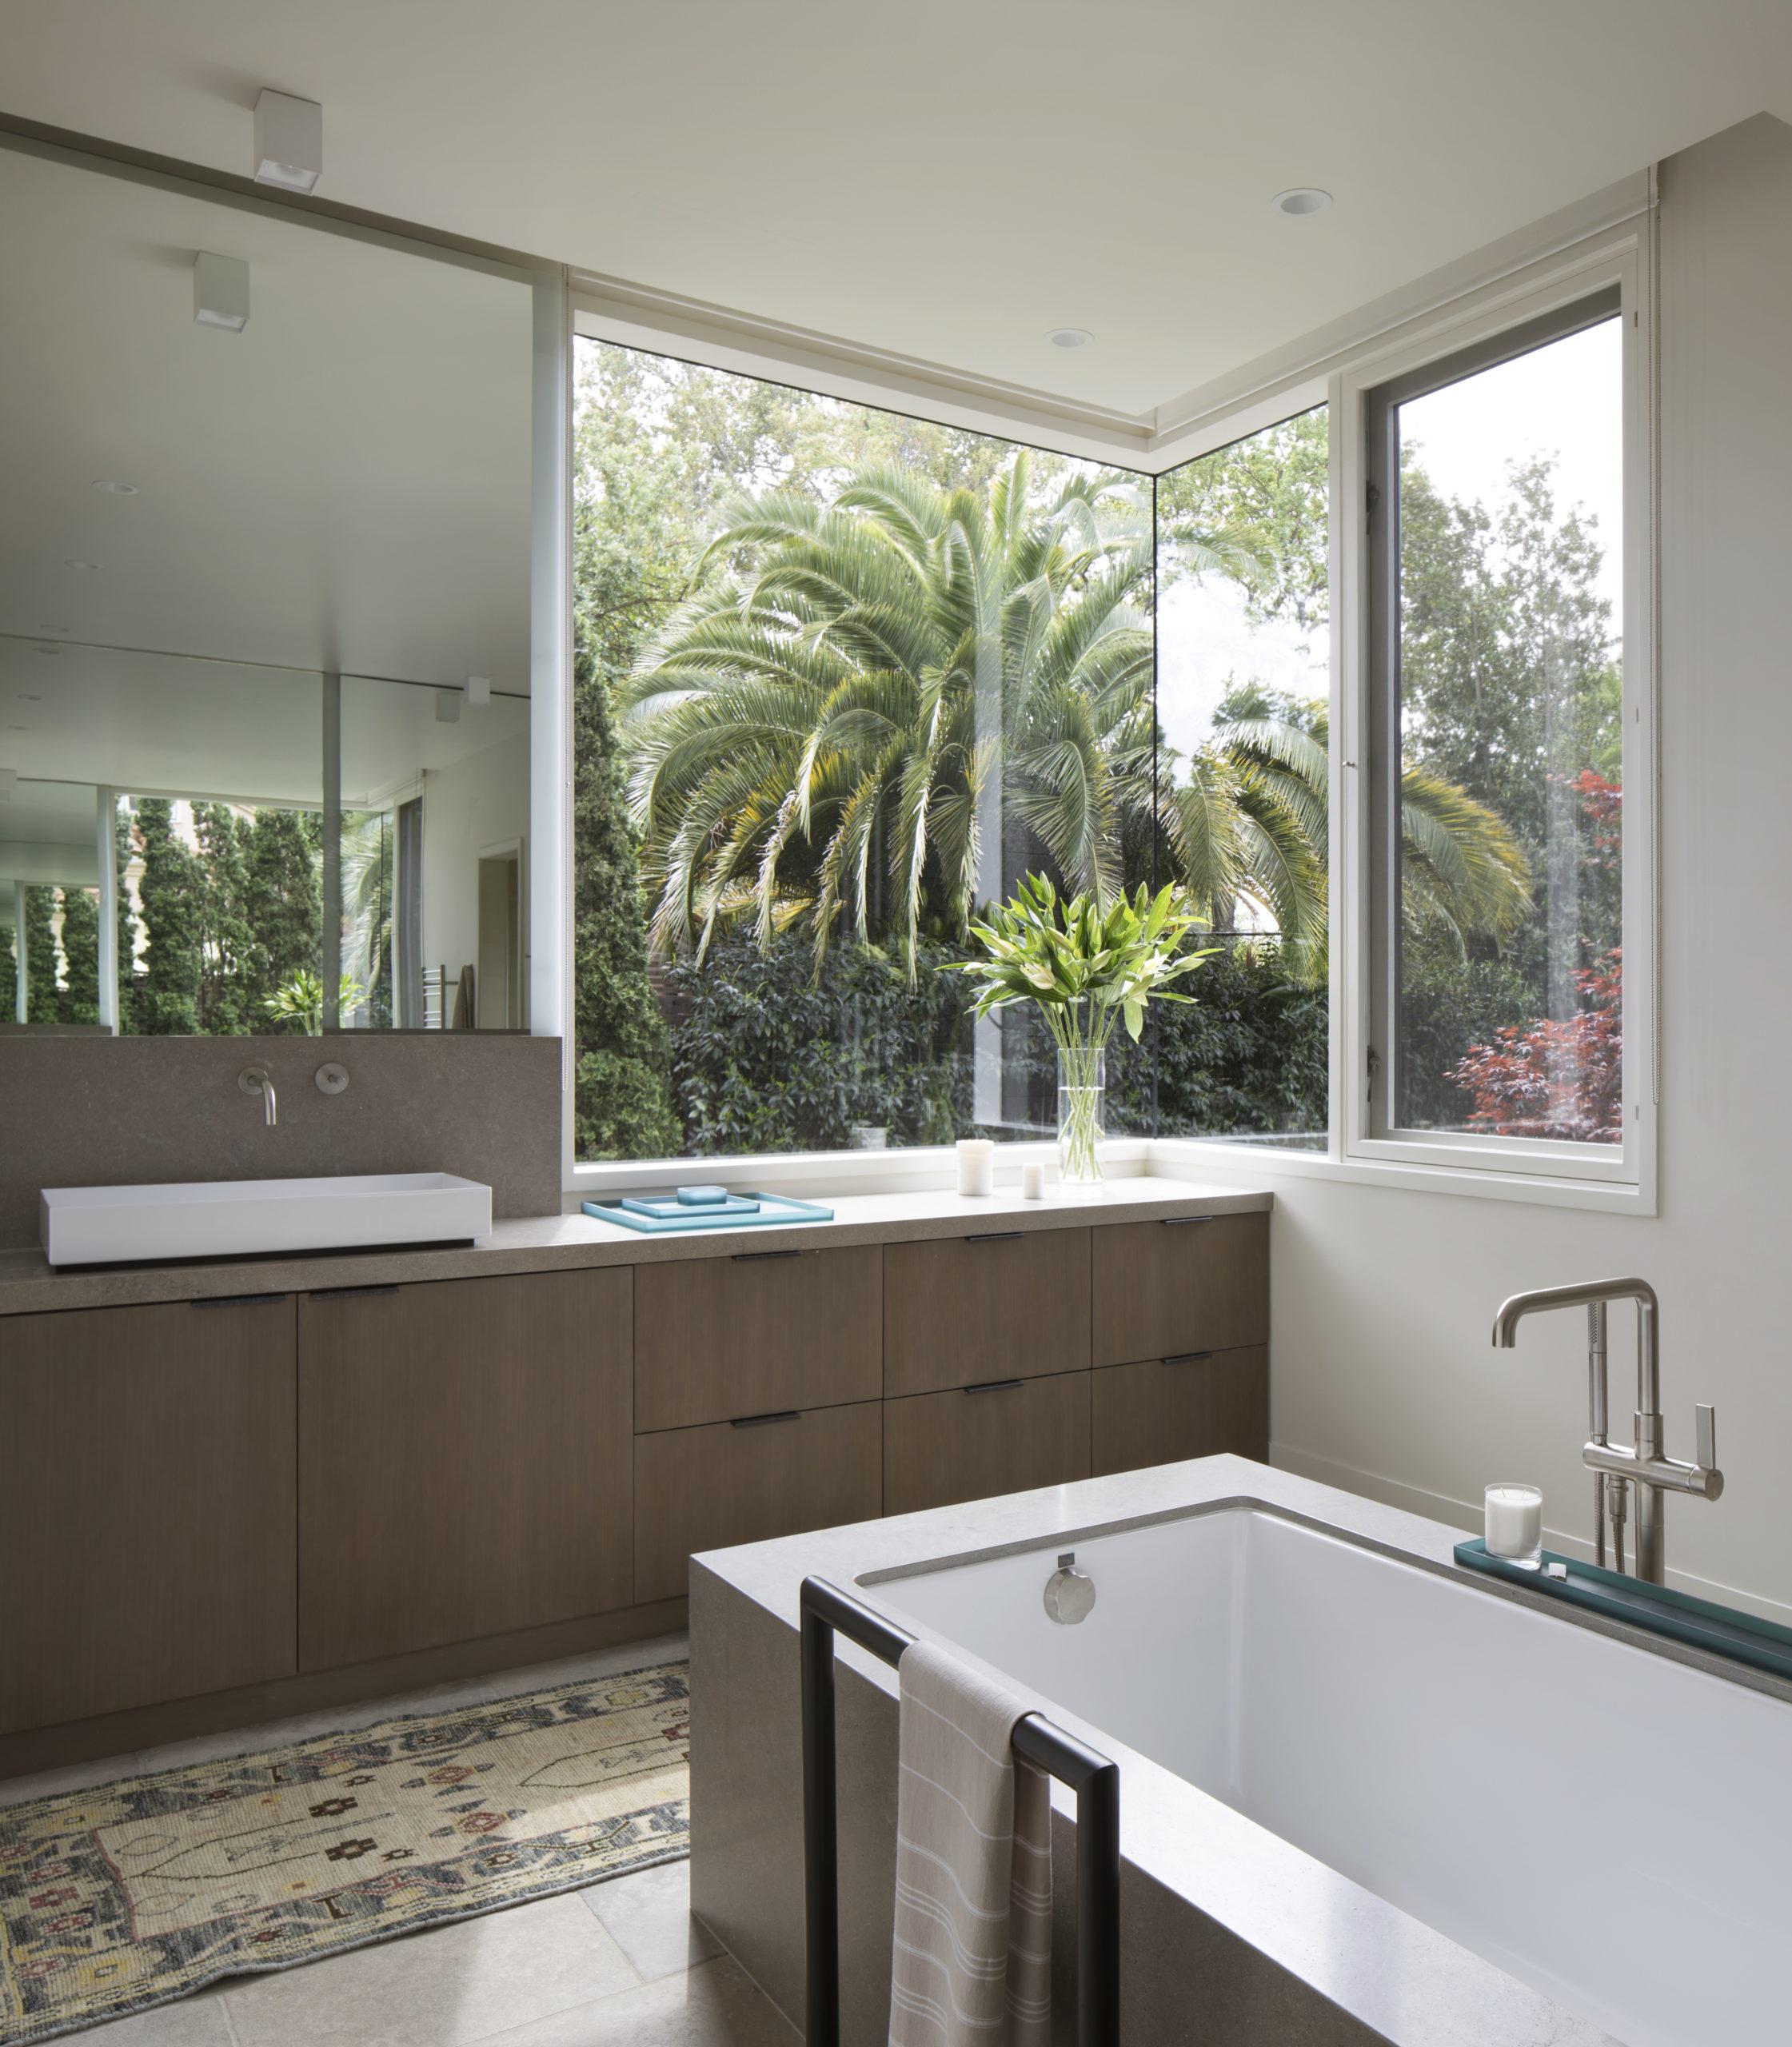 Jennifer_robins_interiors_projects_downtown_sonoma_8_bathroom_sink_bathtub